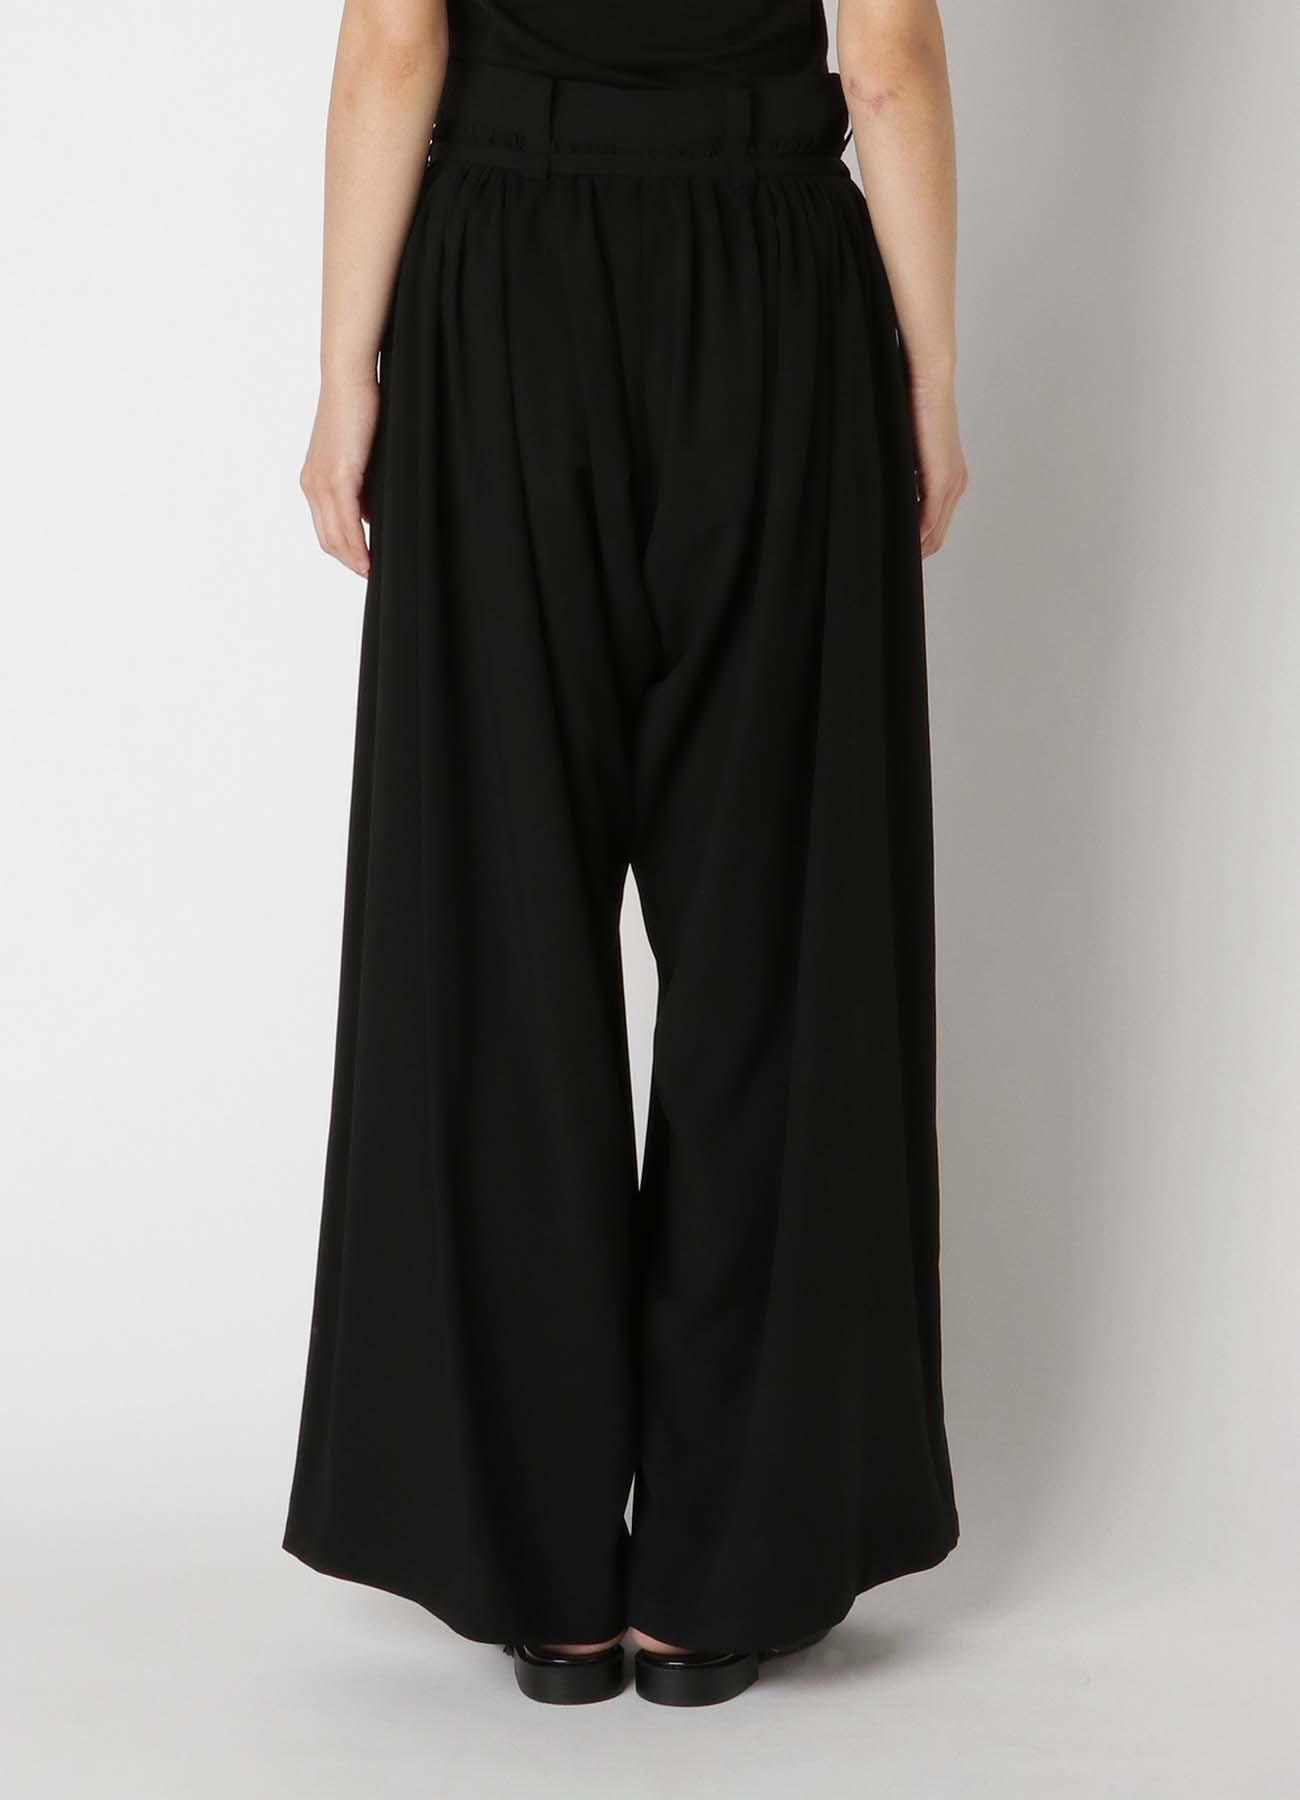 Rayon Cloth Thin Belt Gather Pants